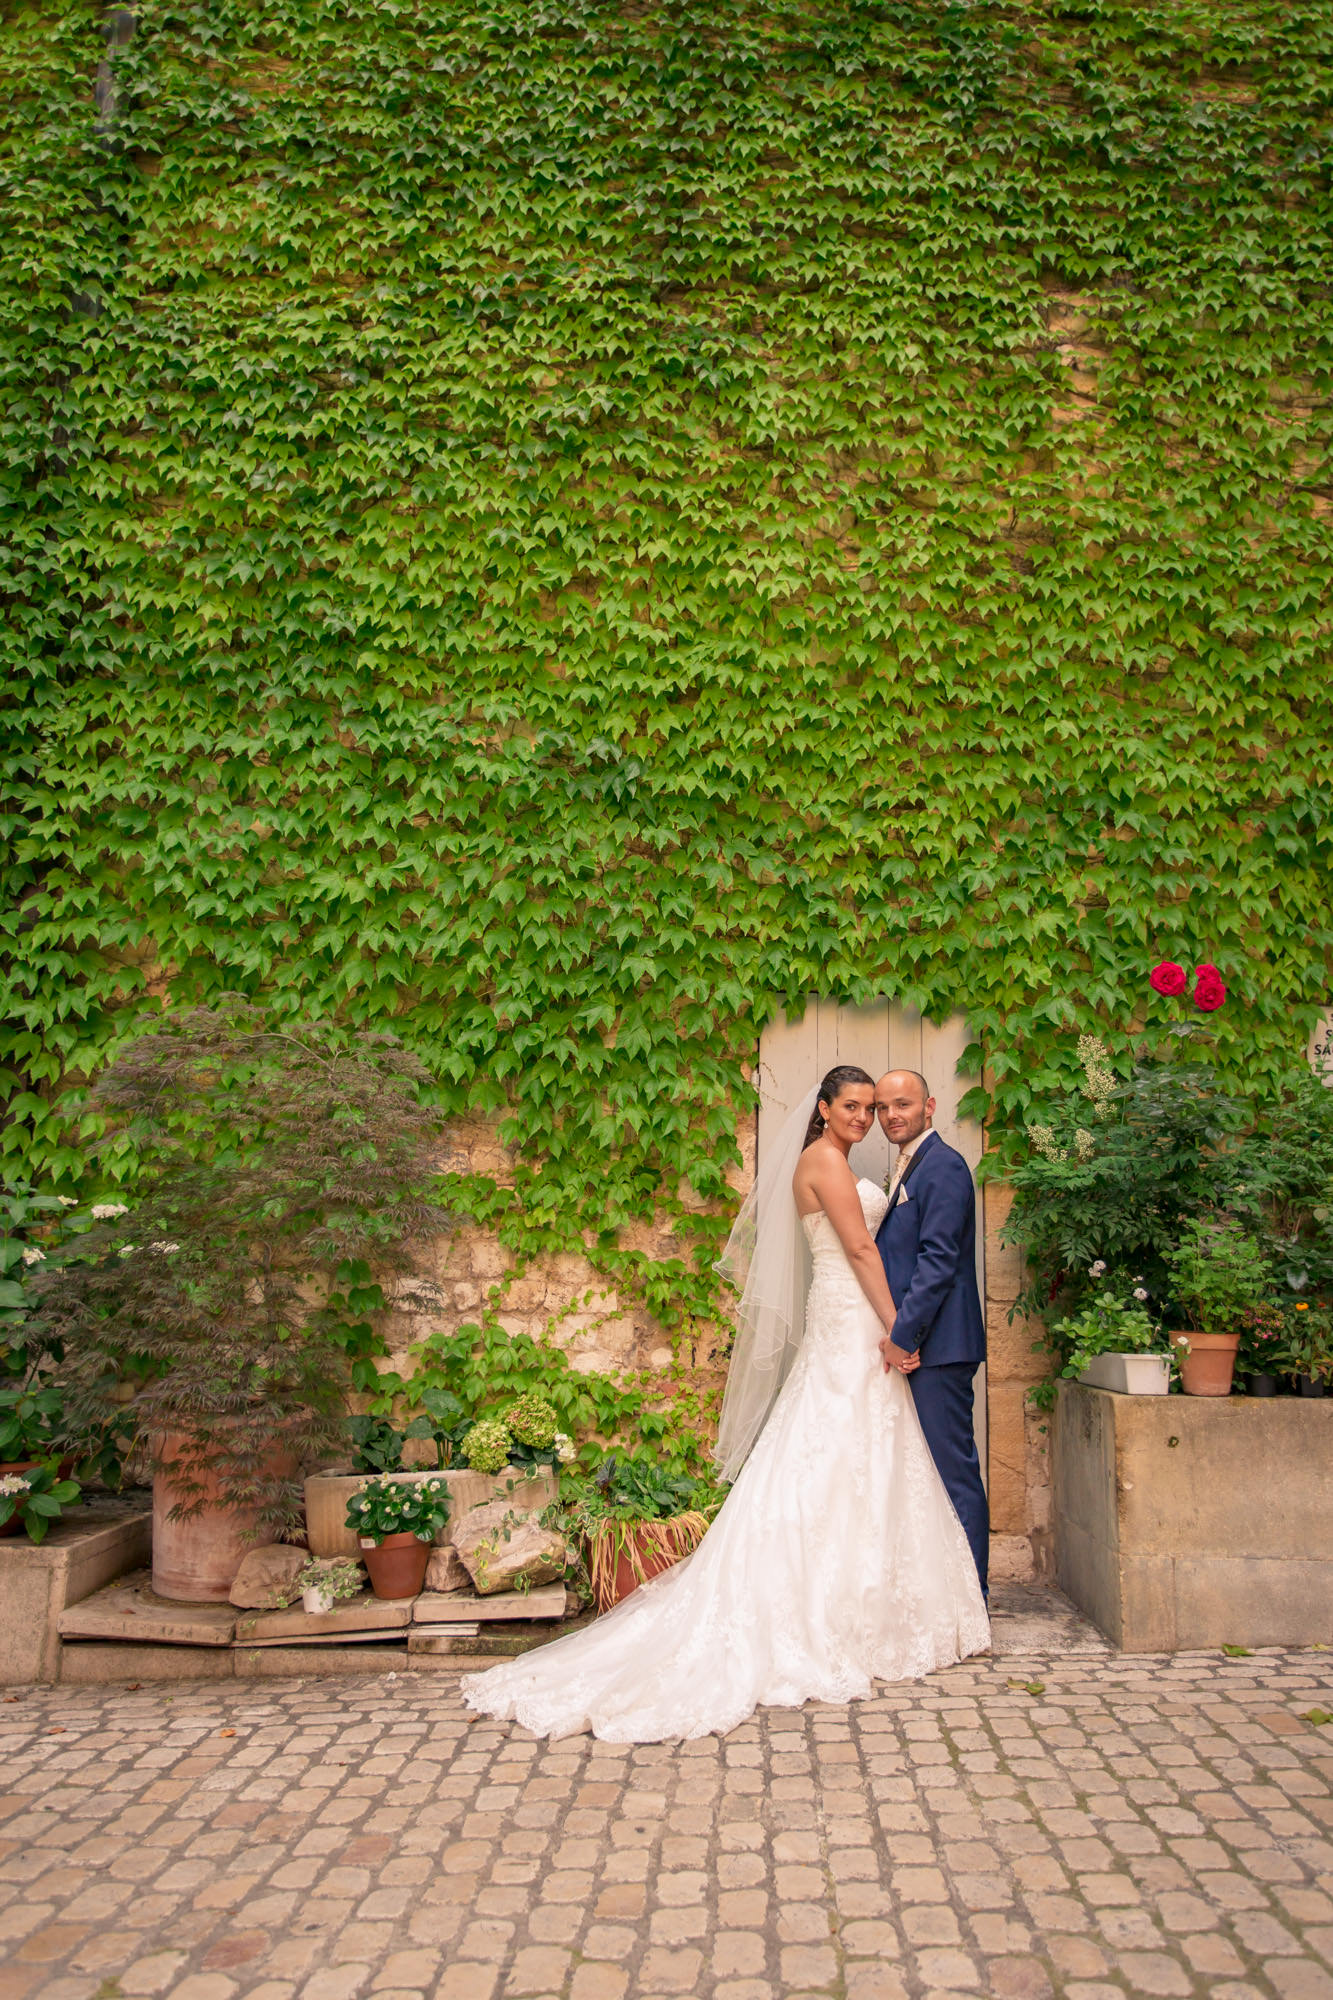 Mariage Provence Aix Chateau La Garde 3